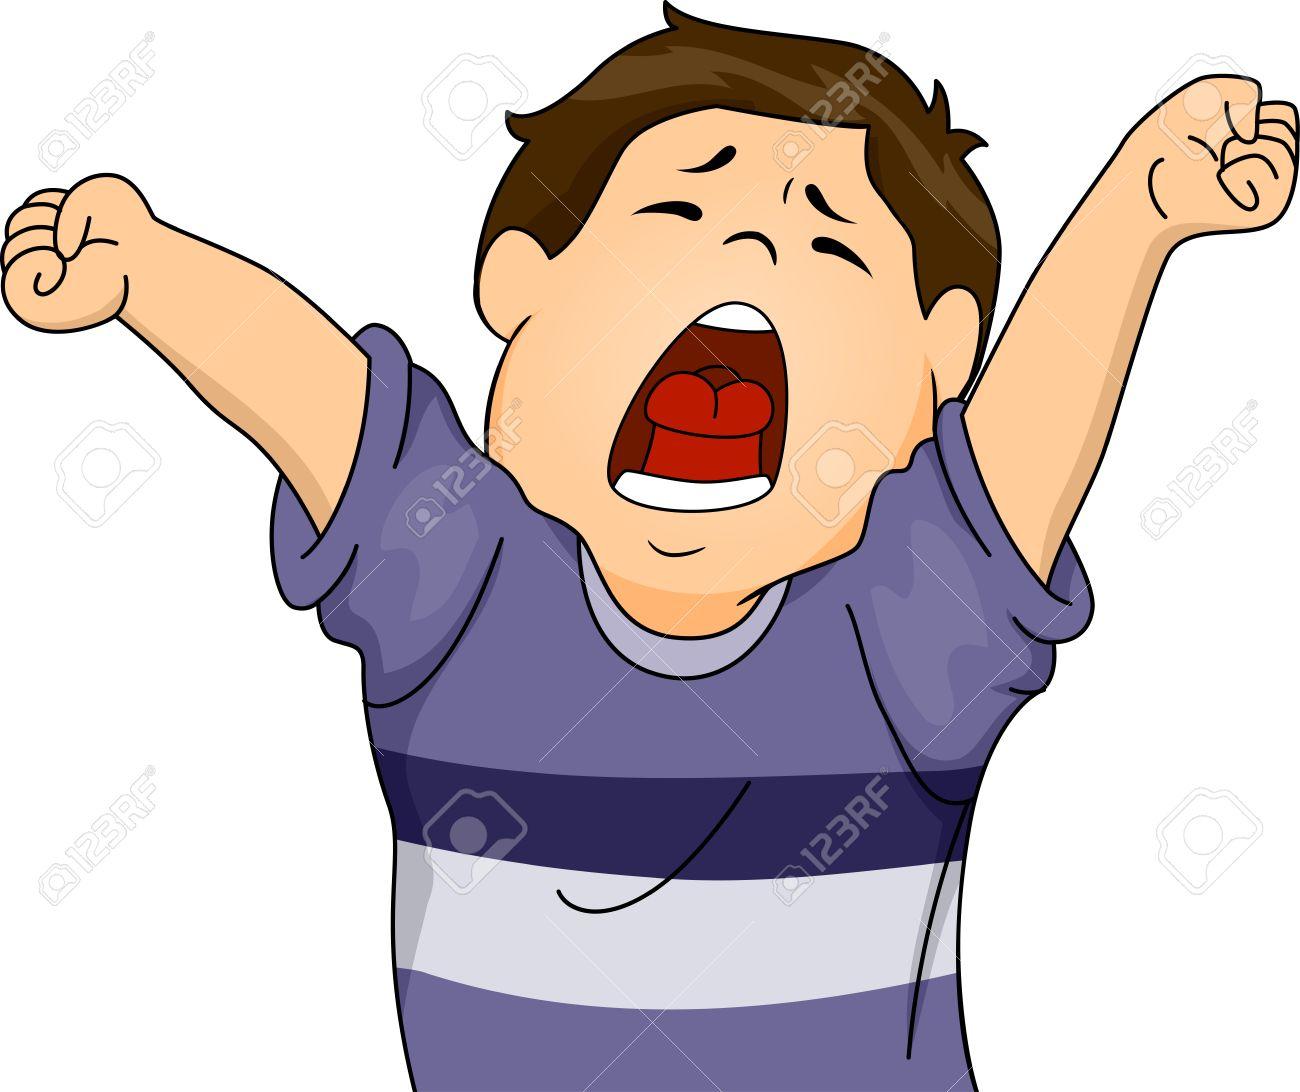 illustration featuring a boy letting out a big yawn while stretching rh 123rf com yawn clipart black and white boy yawn clipart